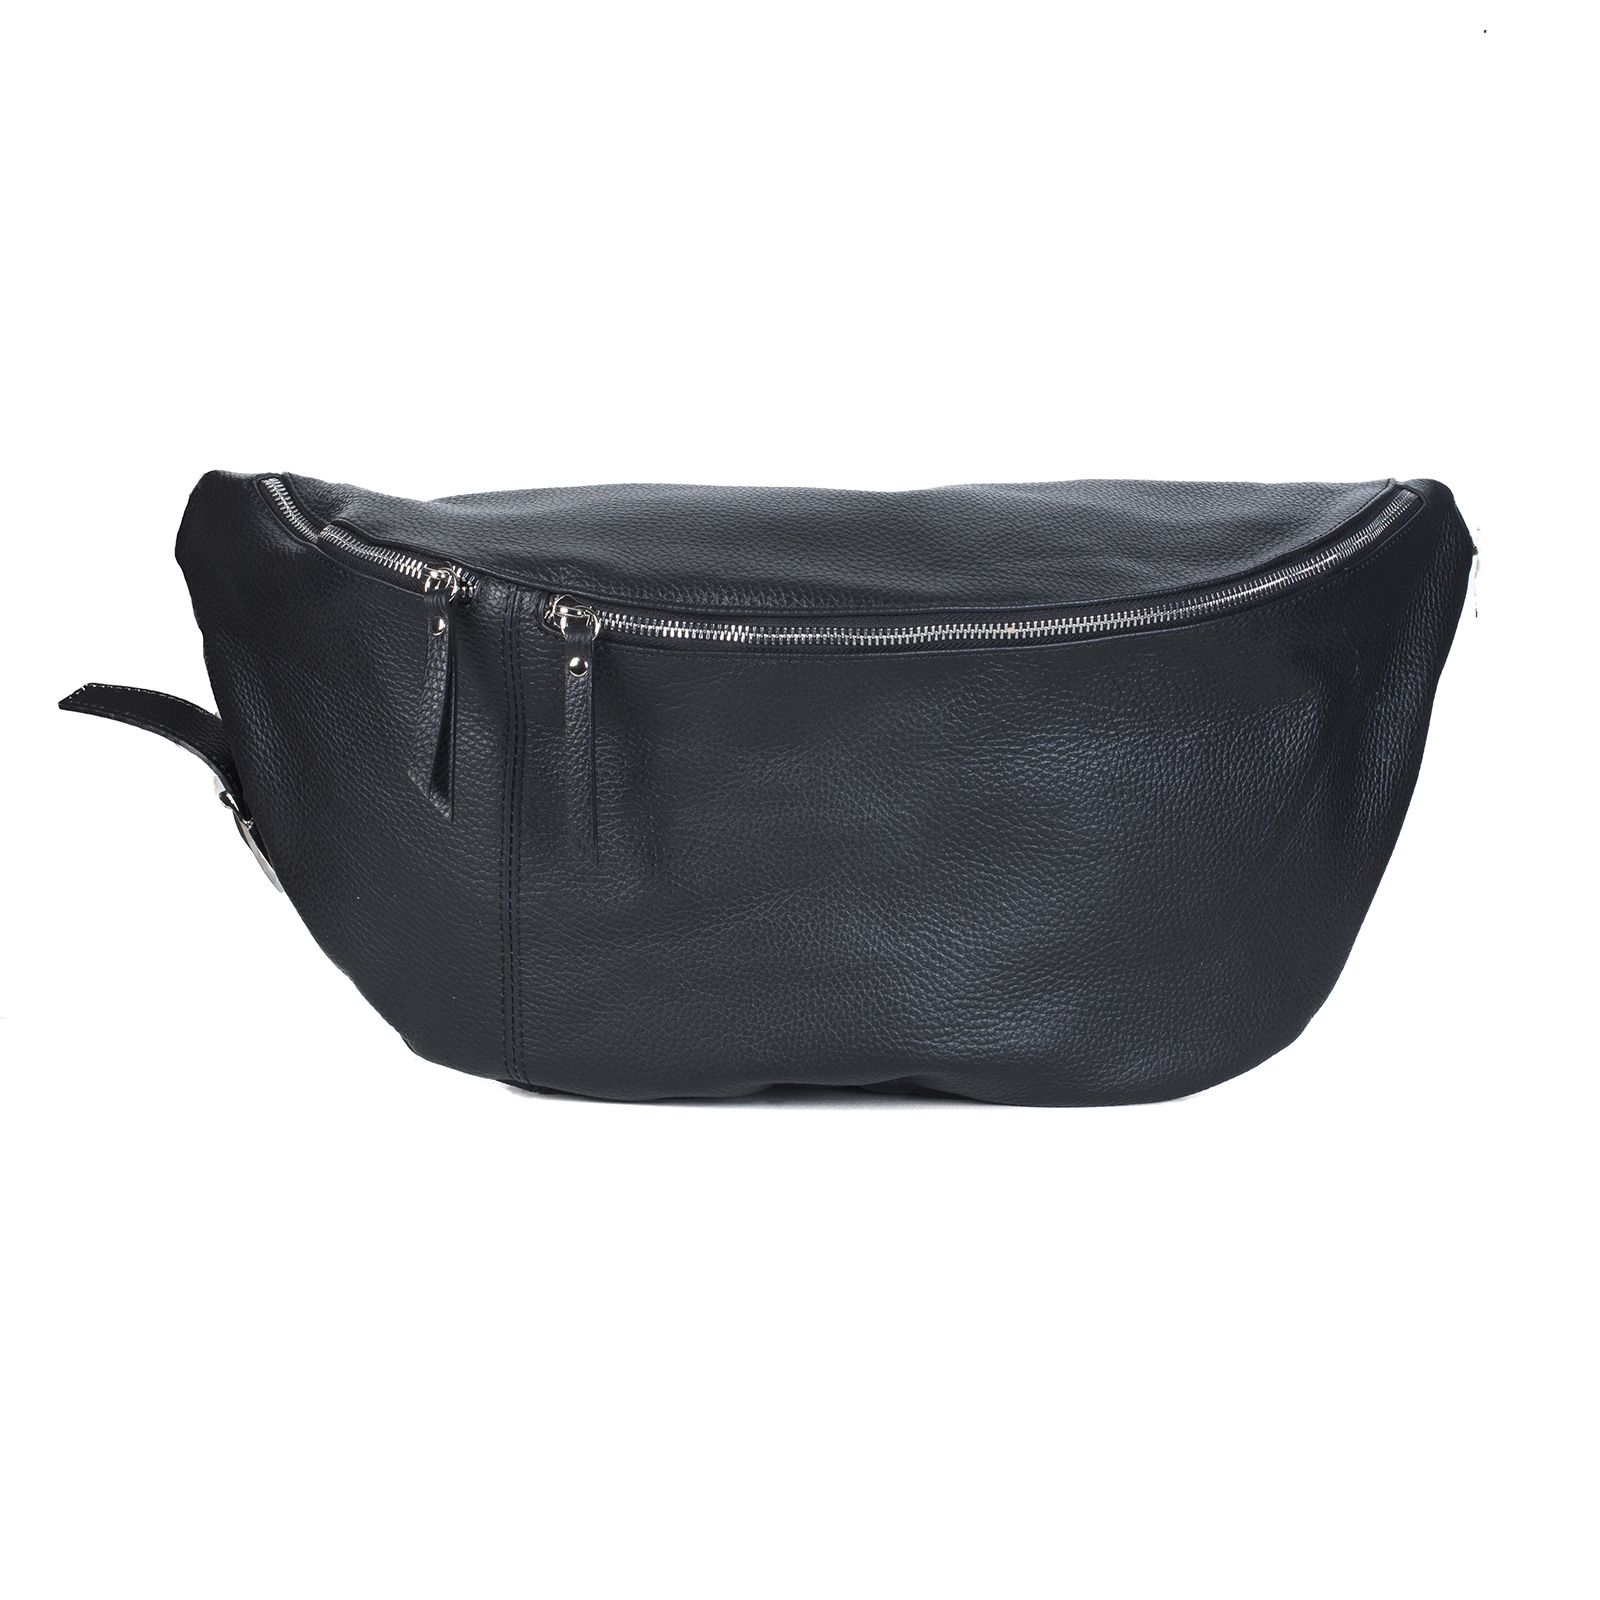 Banana bags, UNO, Banana (черный)